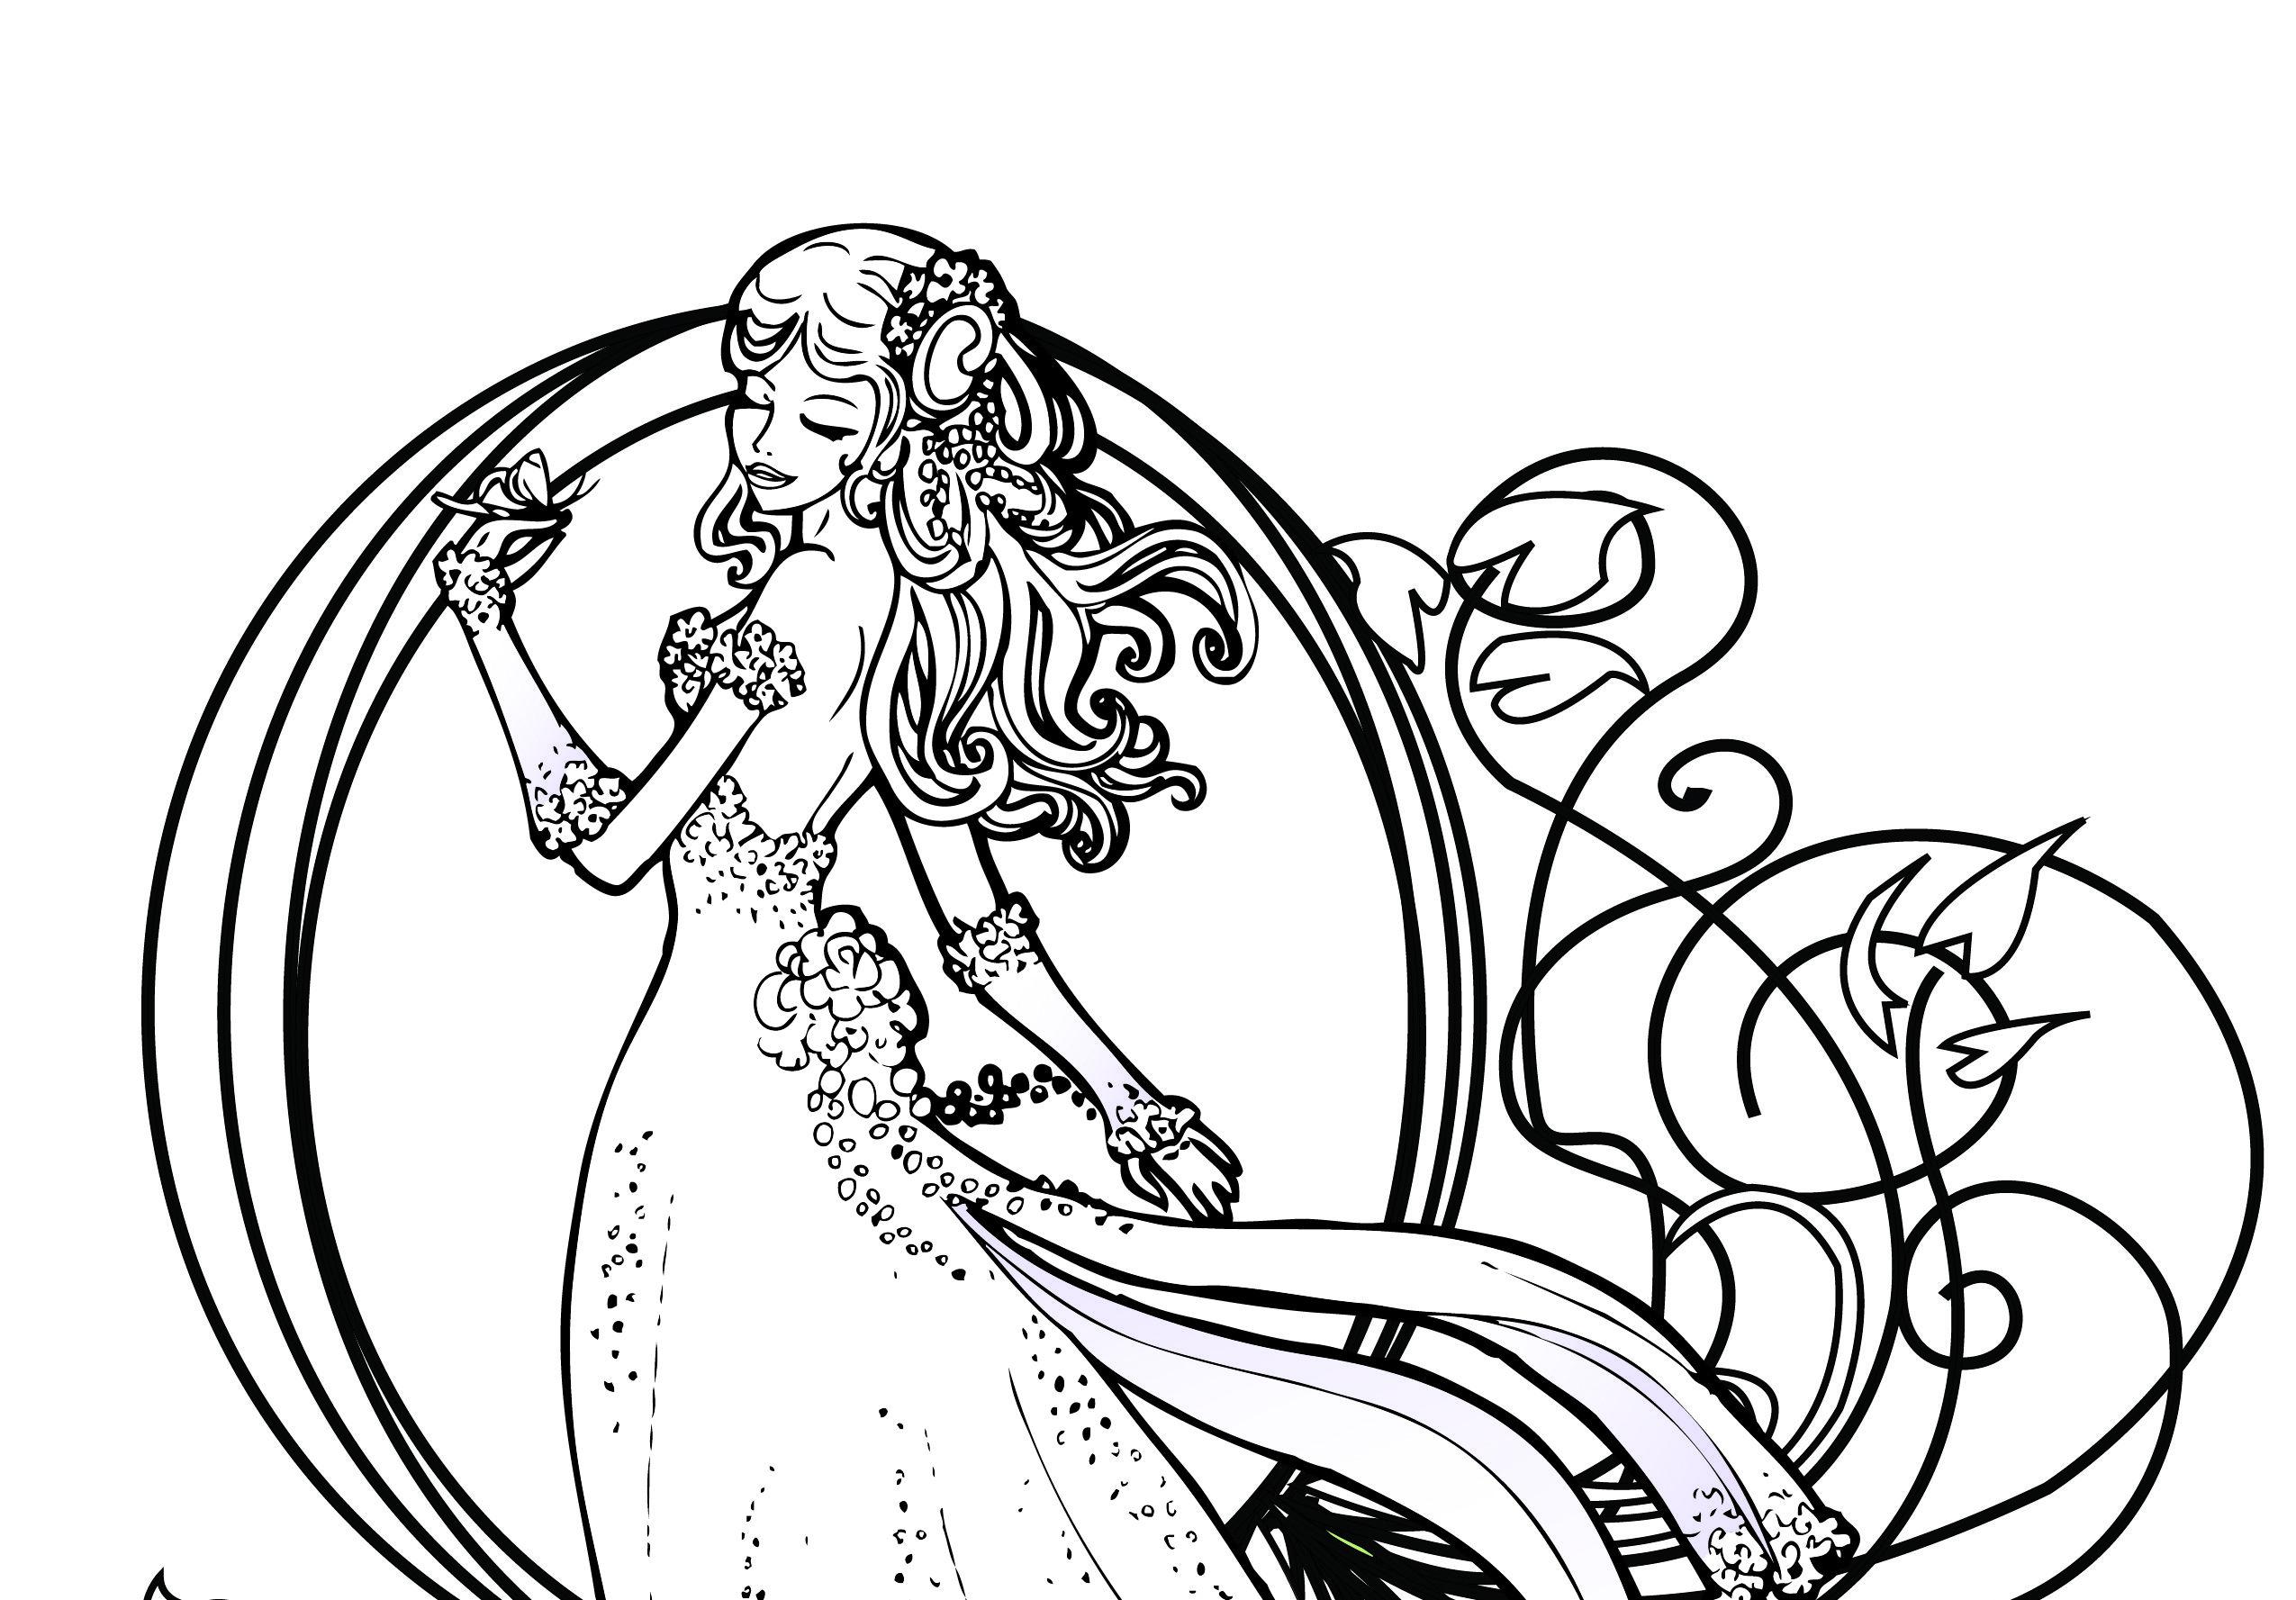 Coloriage De Princesse Disney Gratuit A Imprimer Coloriage